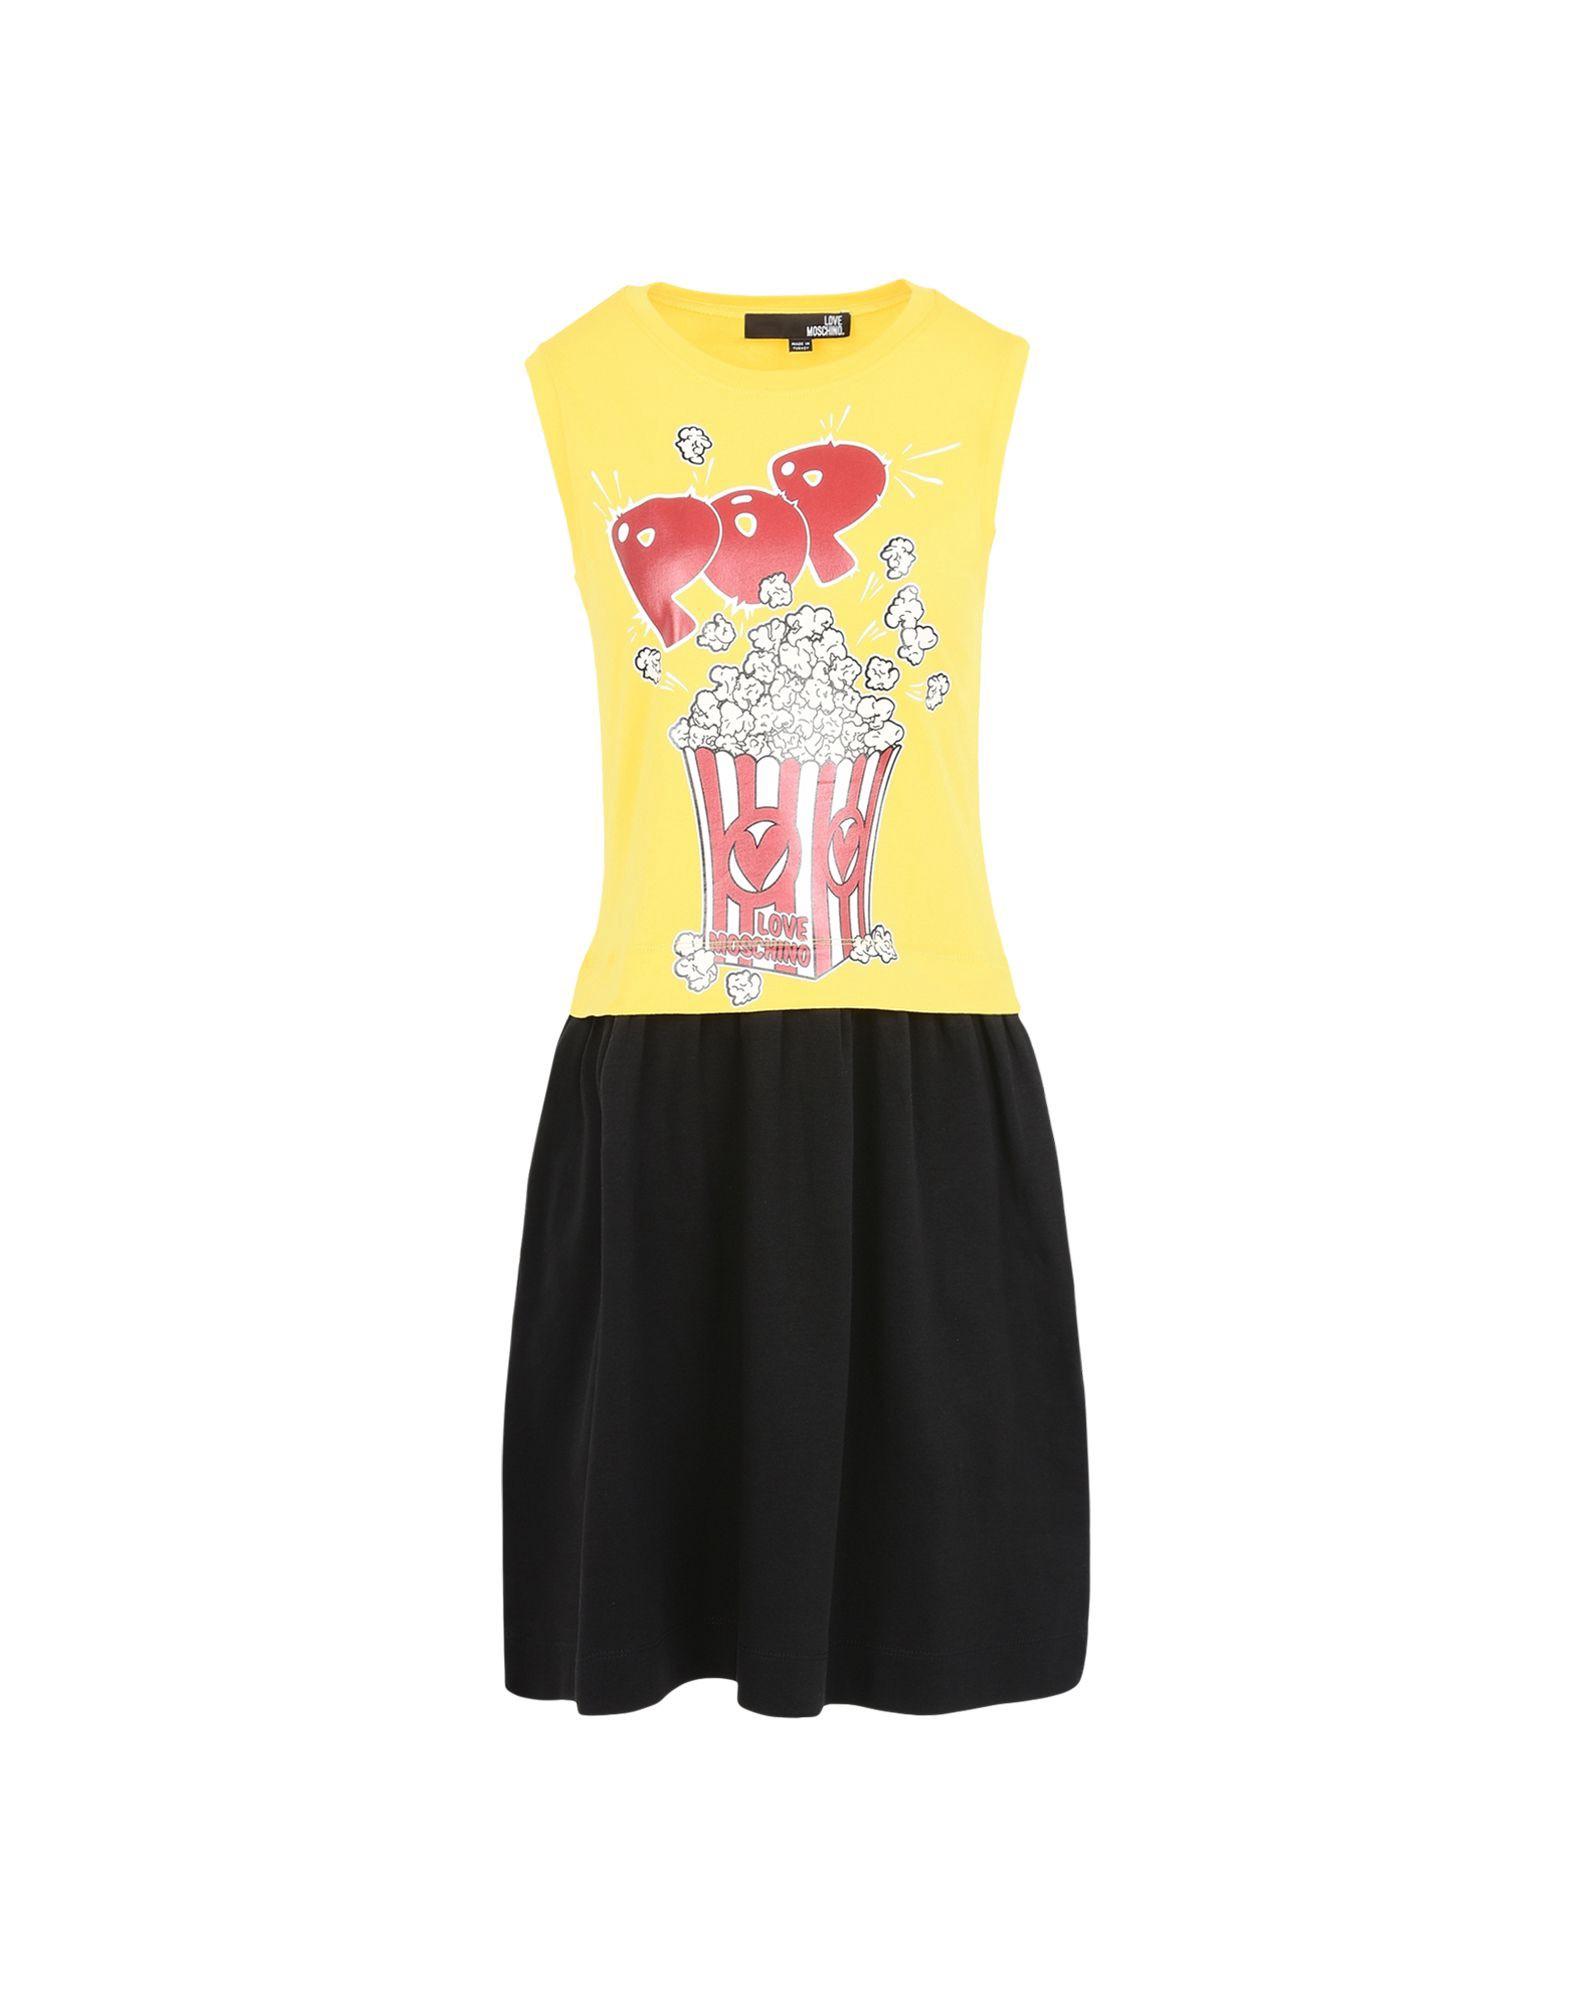 Moschino Pop Corn Dress In Giallo-nero